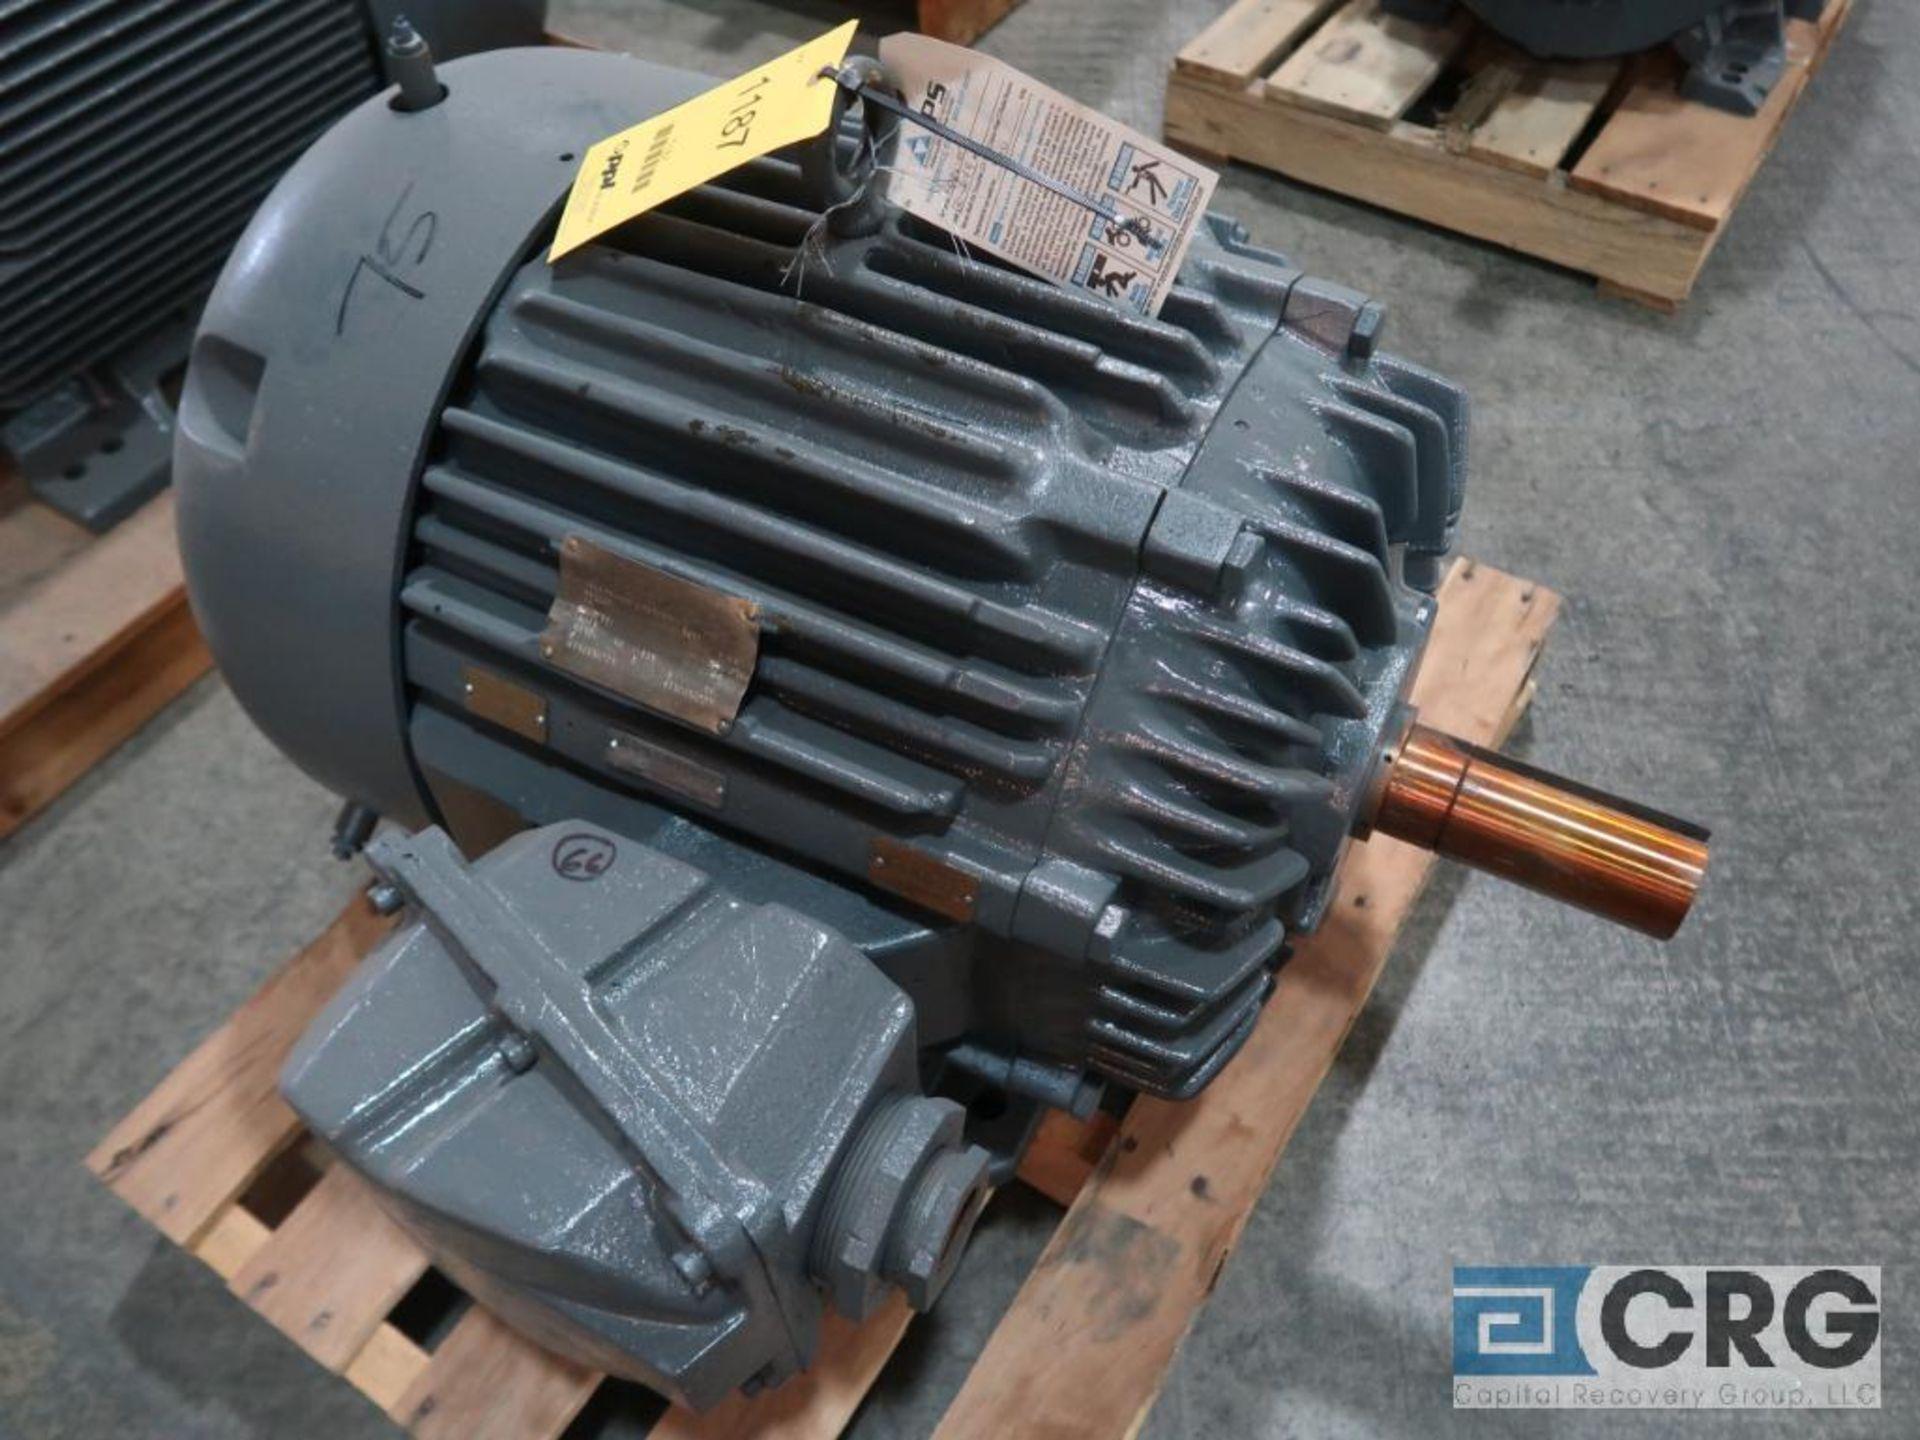 Siemens-Allis PE-21 Efficiency motor, 75 HP, 1,775 RPMs, 460 volt, 3 ph., 365T frame (Finish